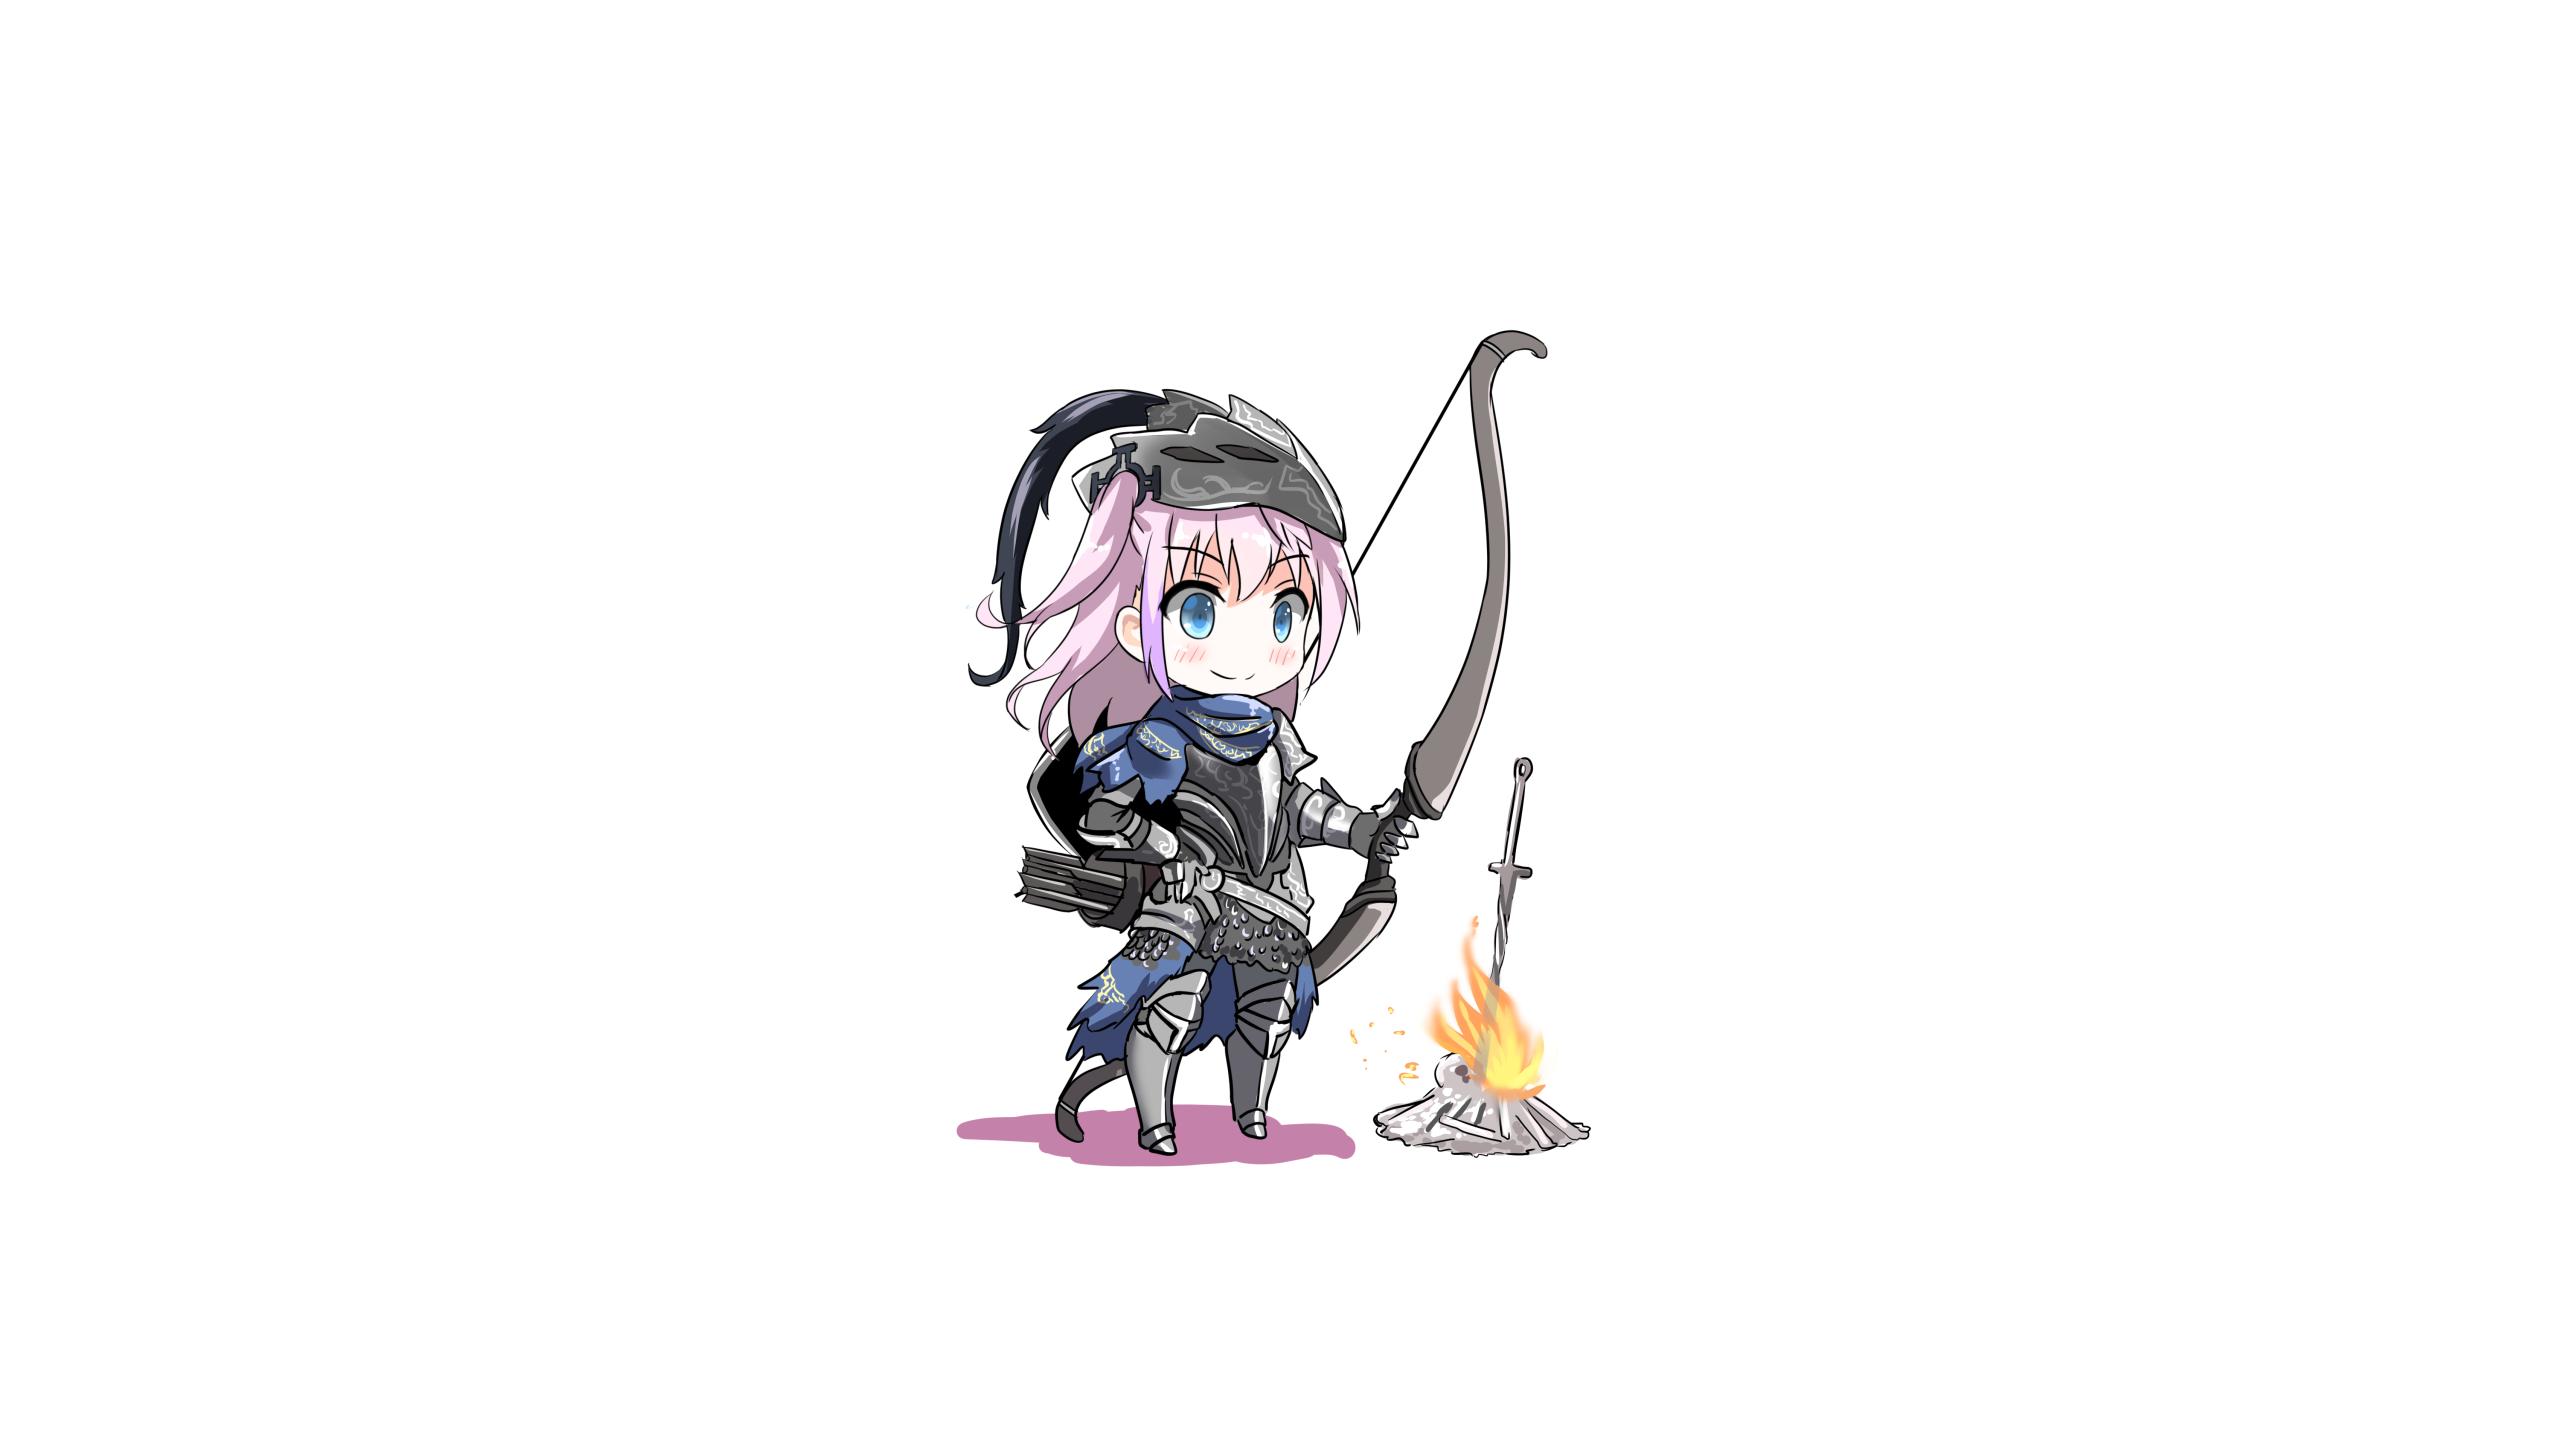 Dark Souls AR15 Girls Frontline Artorias The Abysswalker Bonfire Bow Pink Hair Chibi Fatkewell 2560x1440